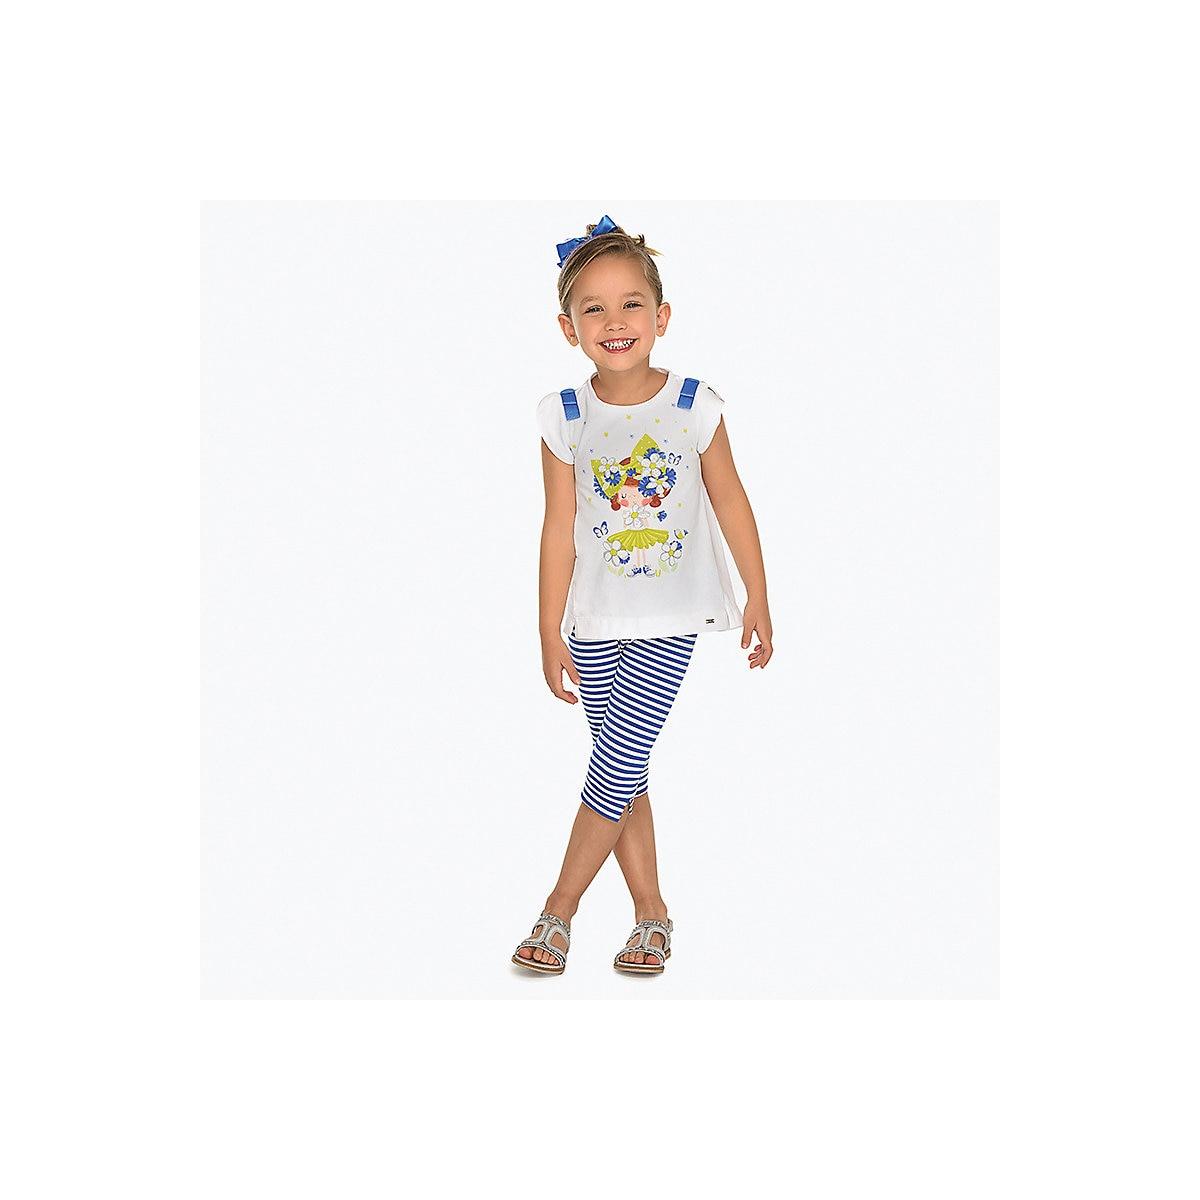 Children's Sets MAYORAL 10678643 Cotton Girls Fashion clothing costume for girl leggings T-shirt mayoral children s sets 8849667 cotton girls fashion clothing costume for girl leggings t shirt